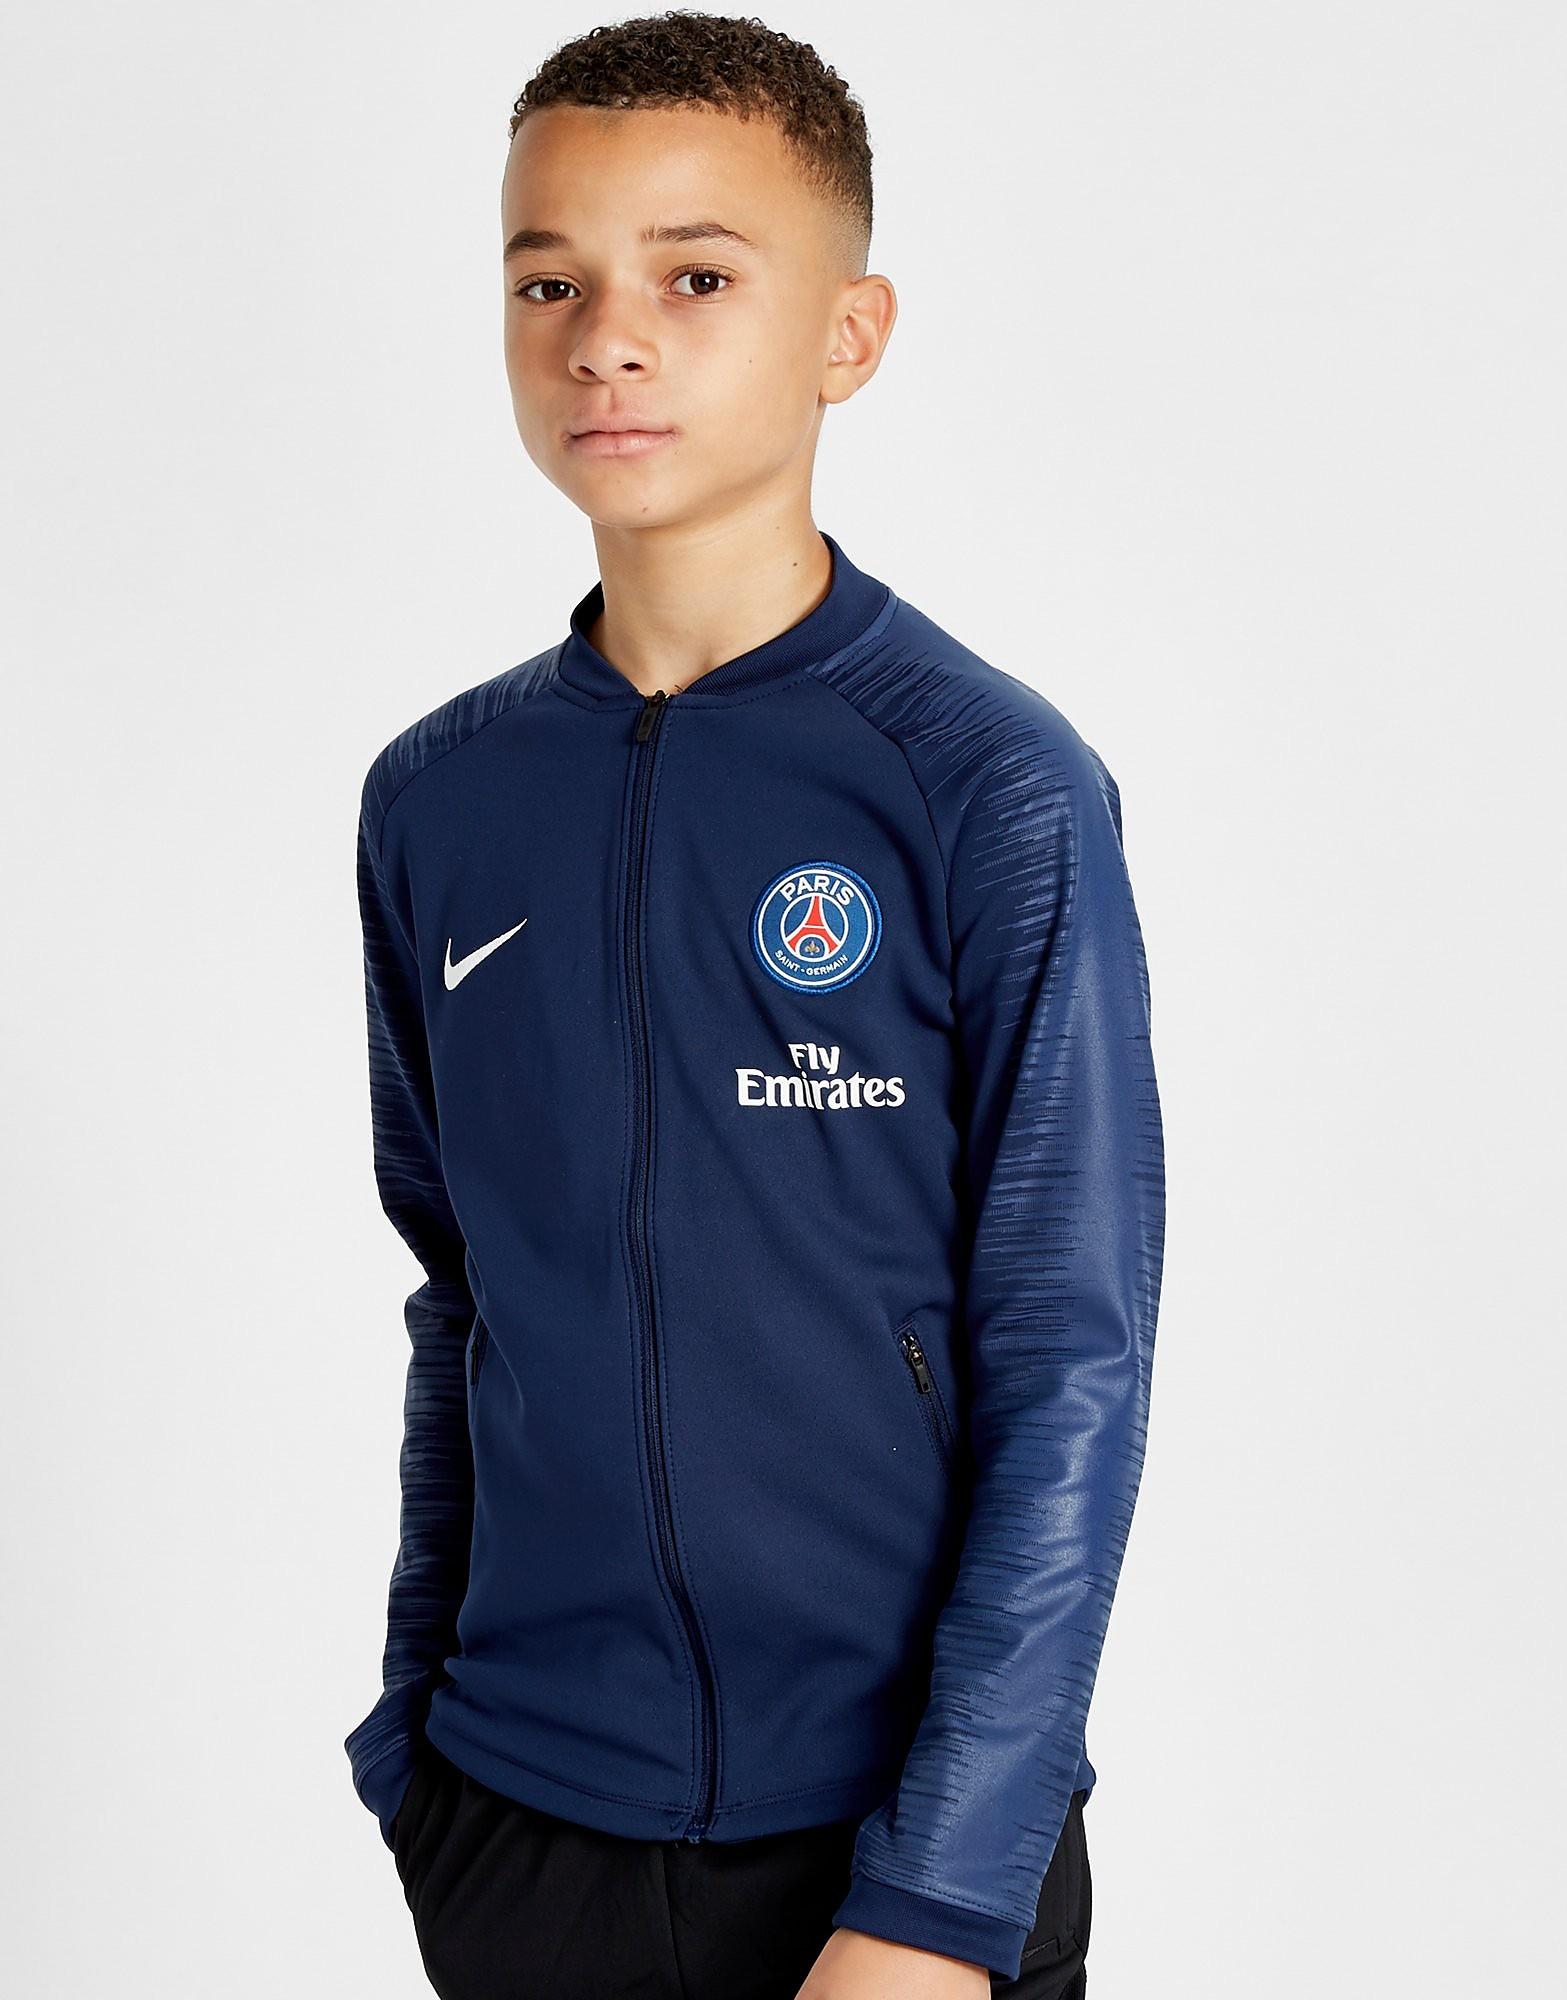 Nike Veste Anthem Paris Saint Germain 2018/19 Junior